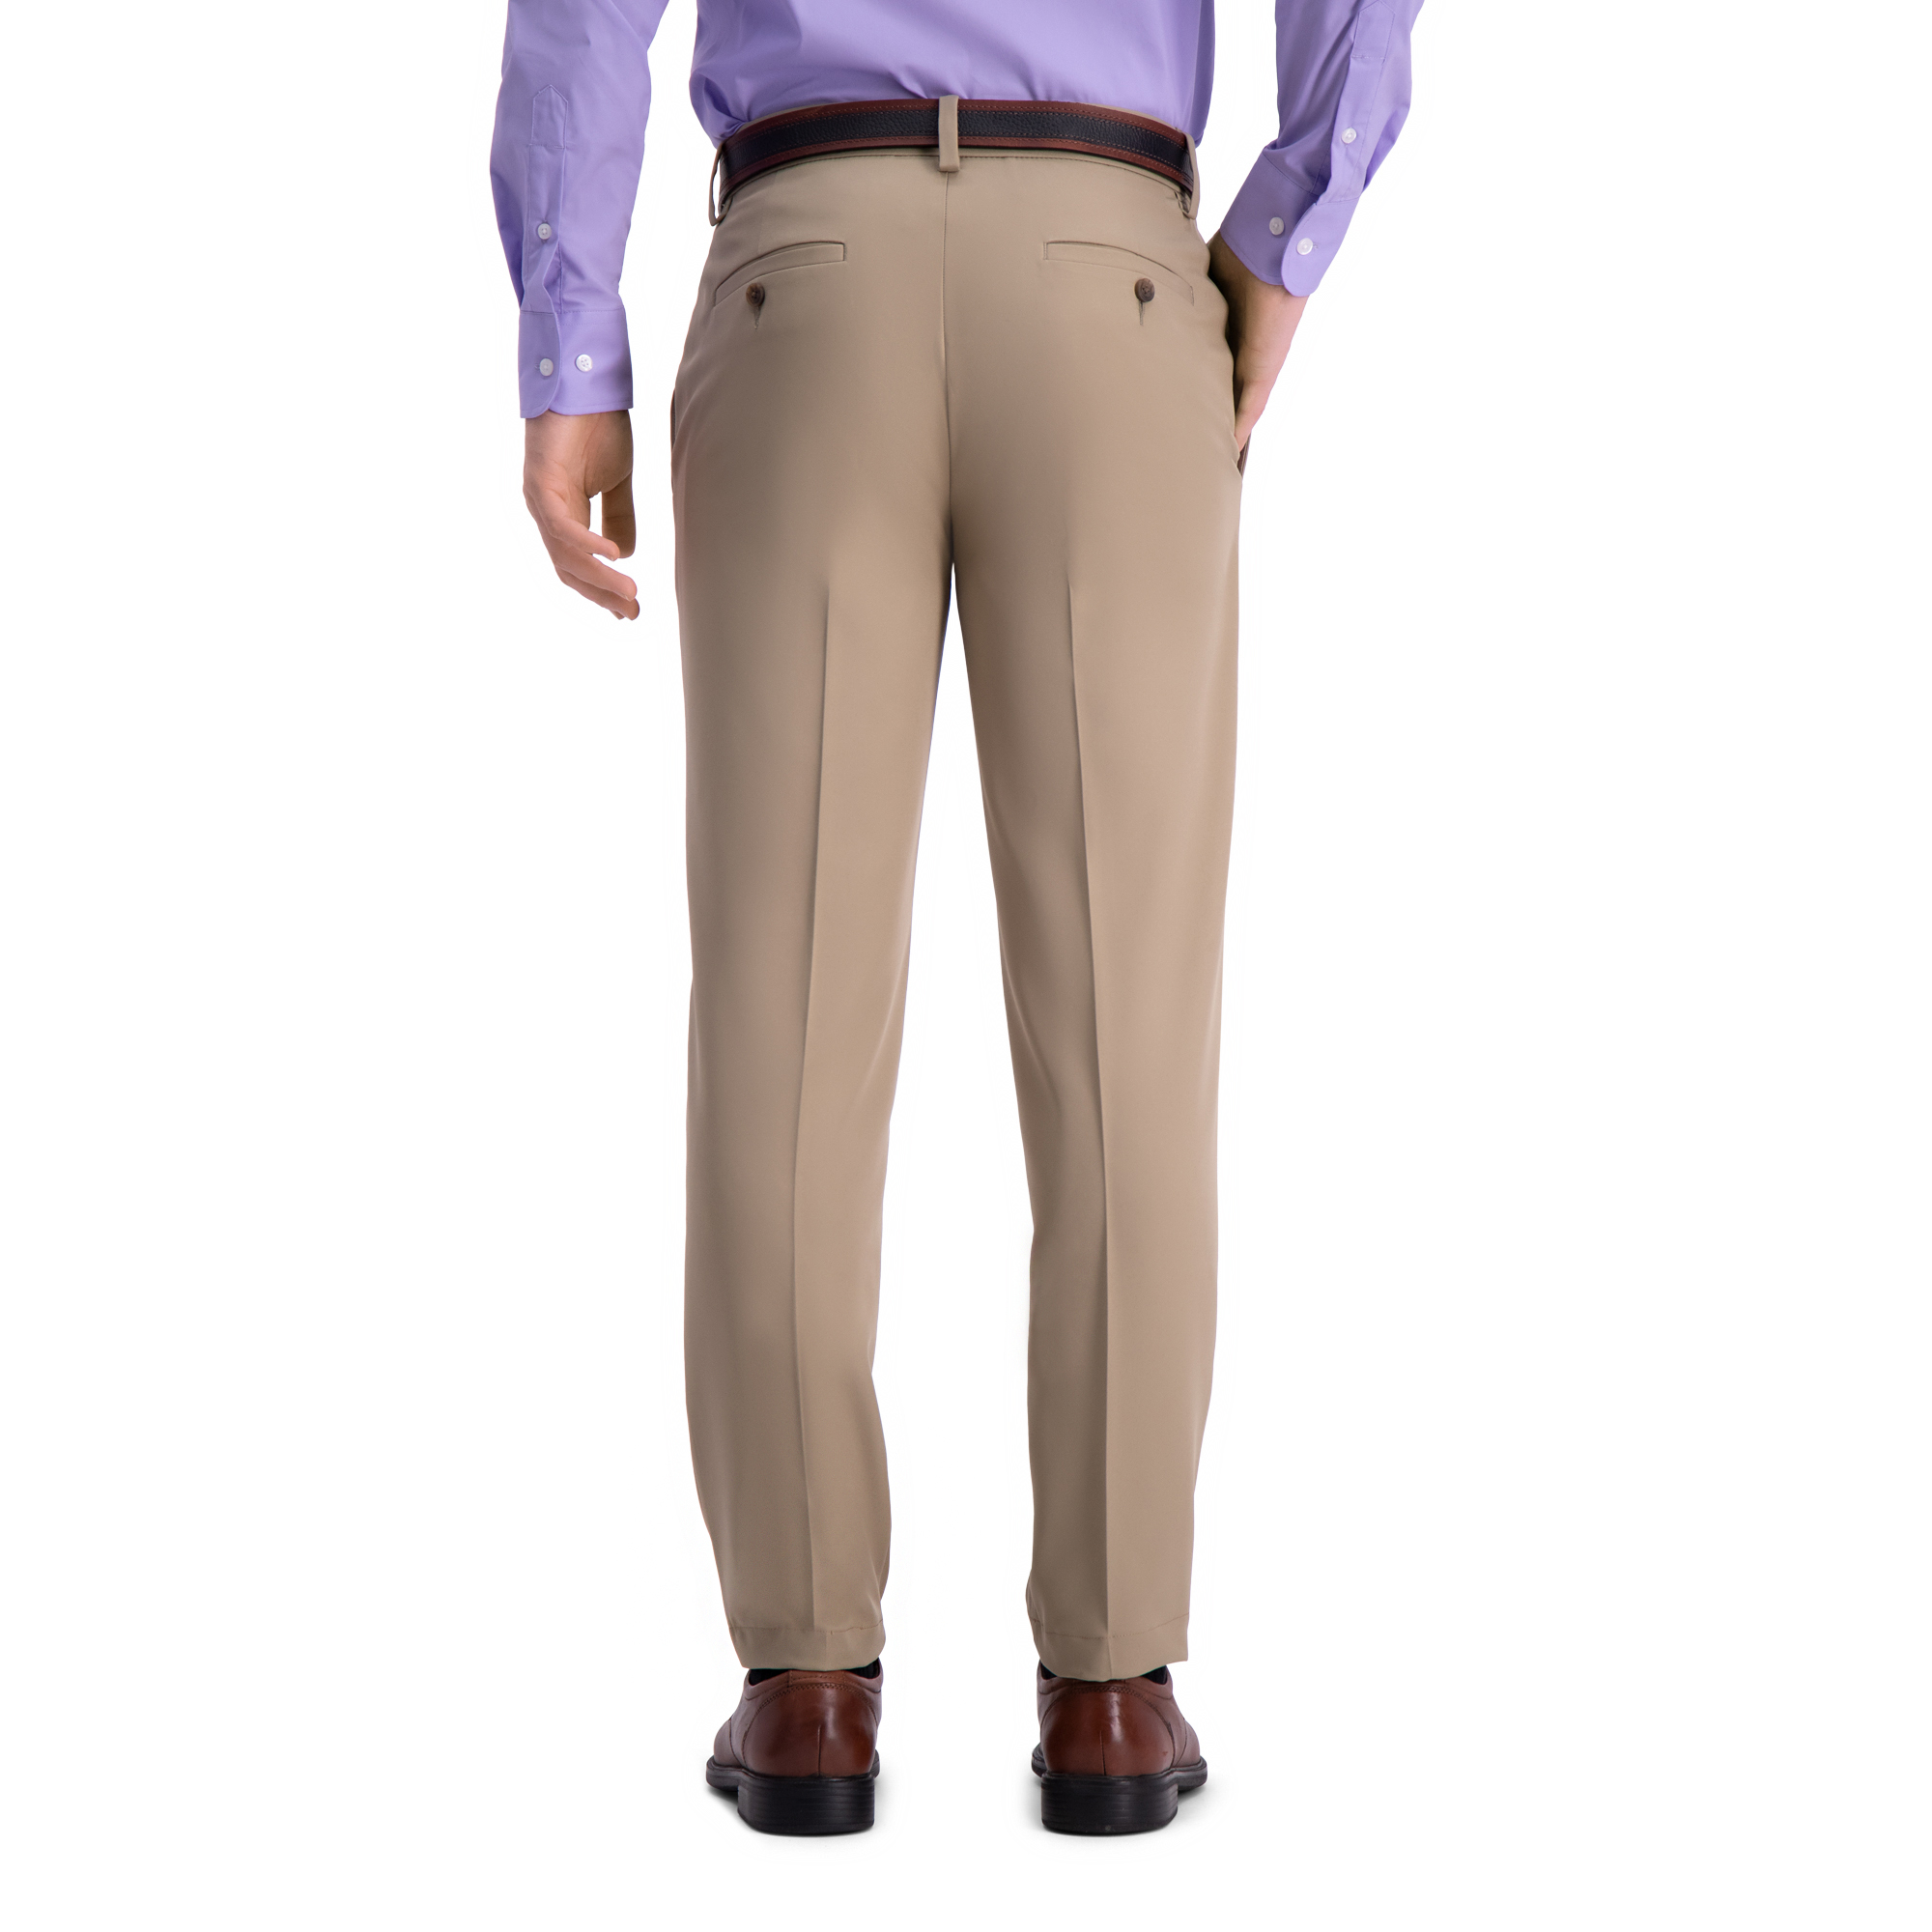 5f617974bc5 Haggar Men s Cool 18® Pro Solid Flat Front Pant Slim Fit HC00287